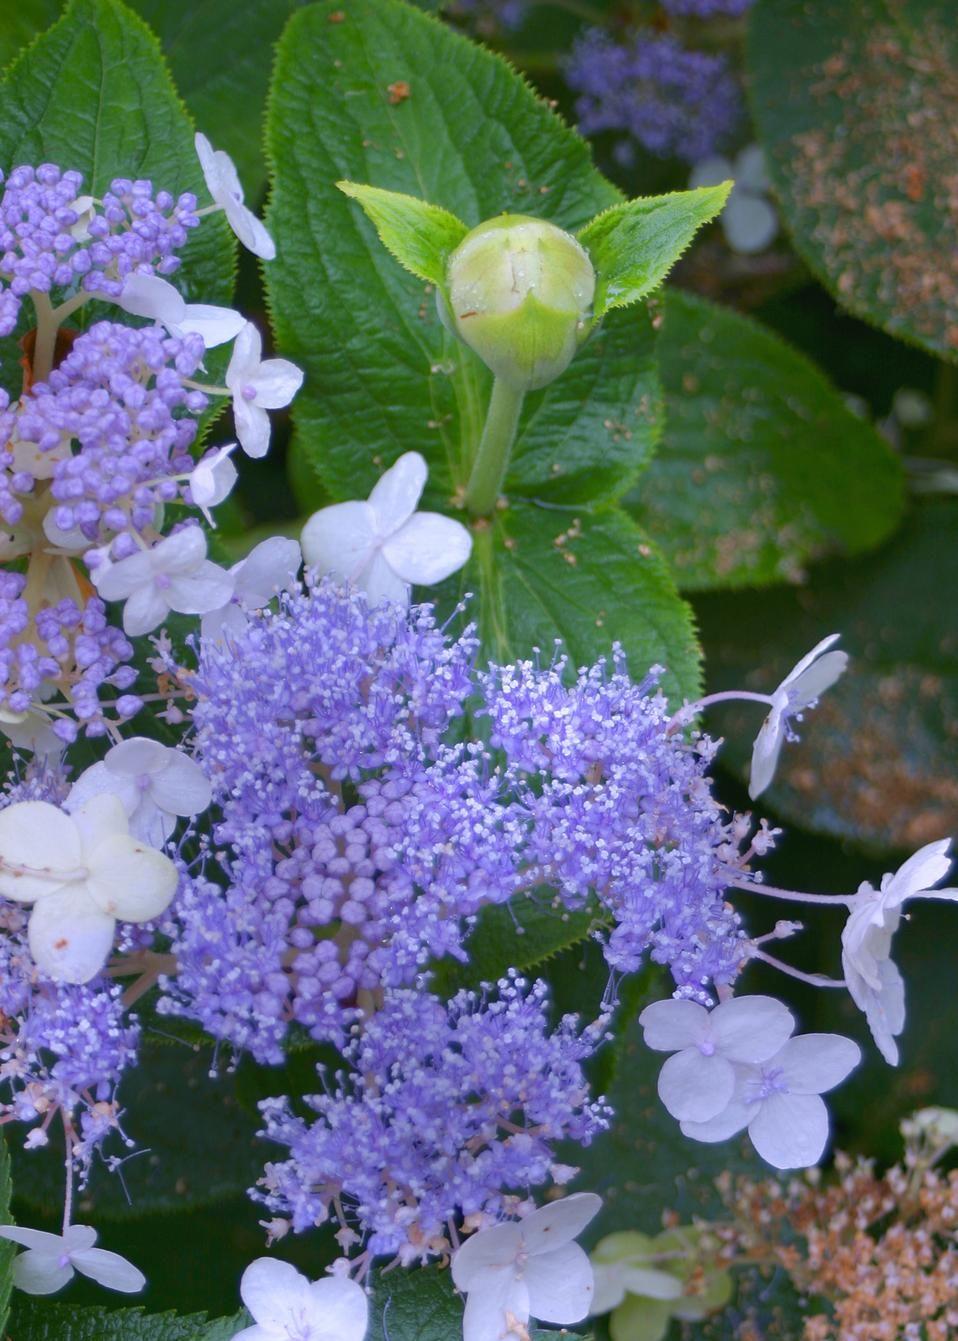 Blue Bunny Bracted Hydrangea Hydrangea Involucrata Flowering Shrubs Hydrangea Shrub Blue Hydrangea